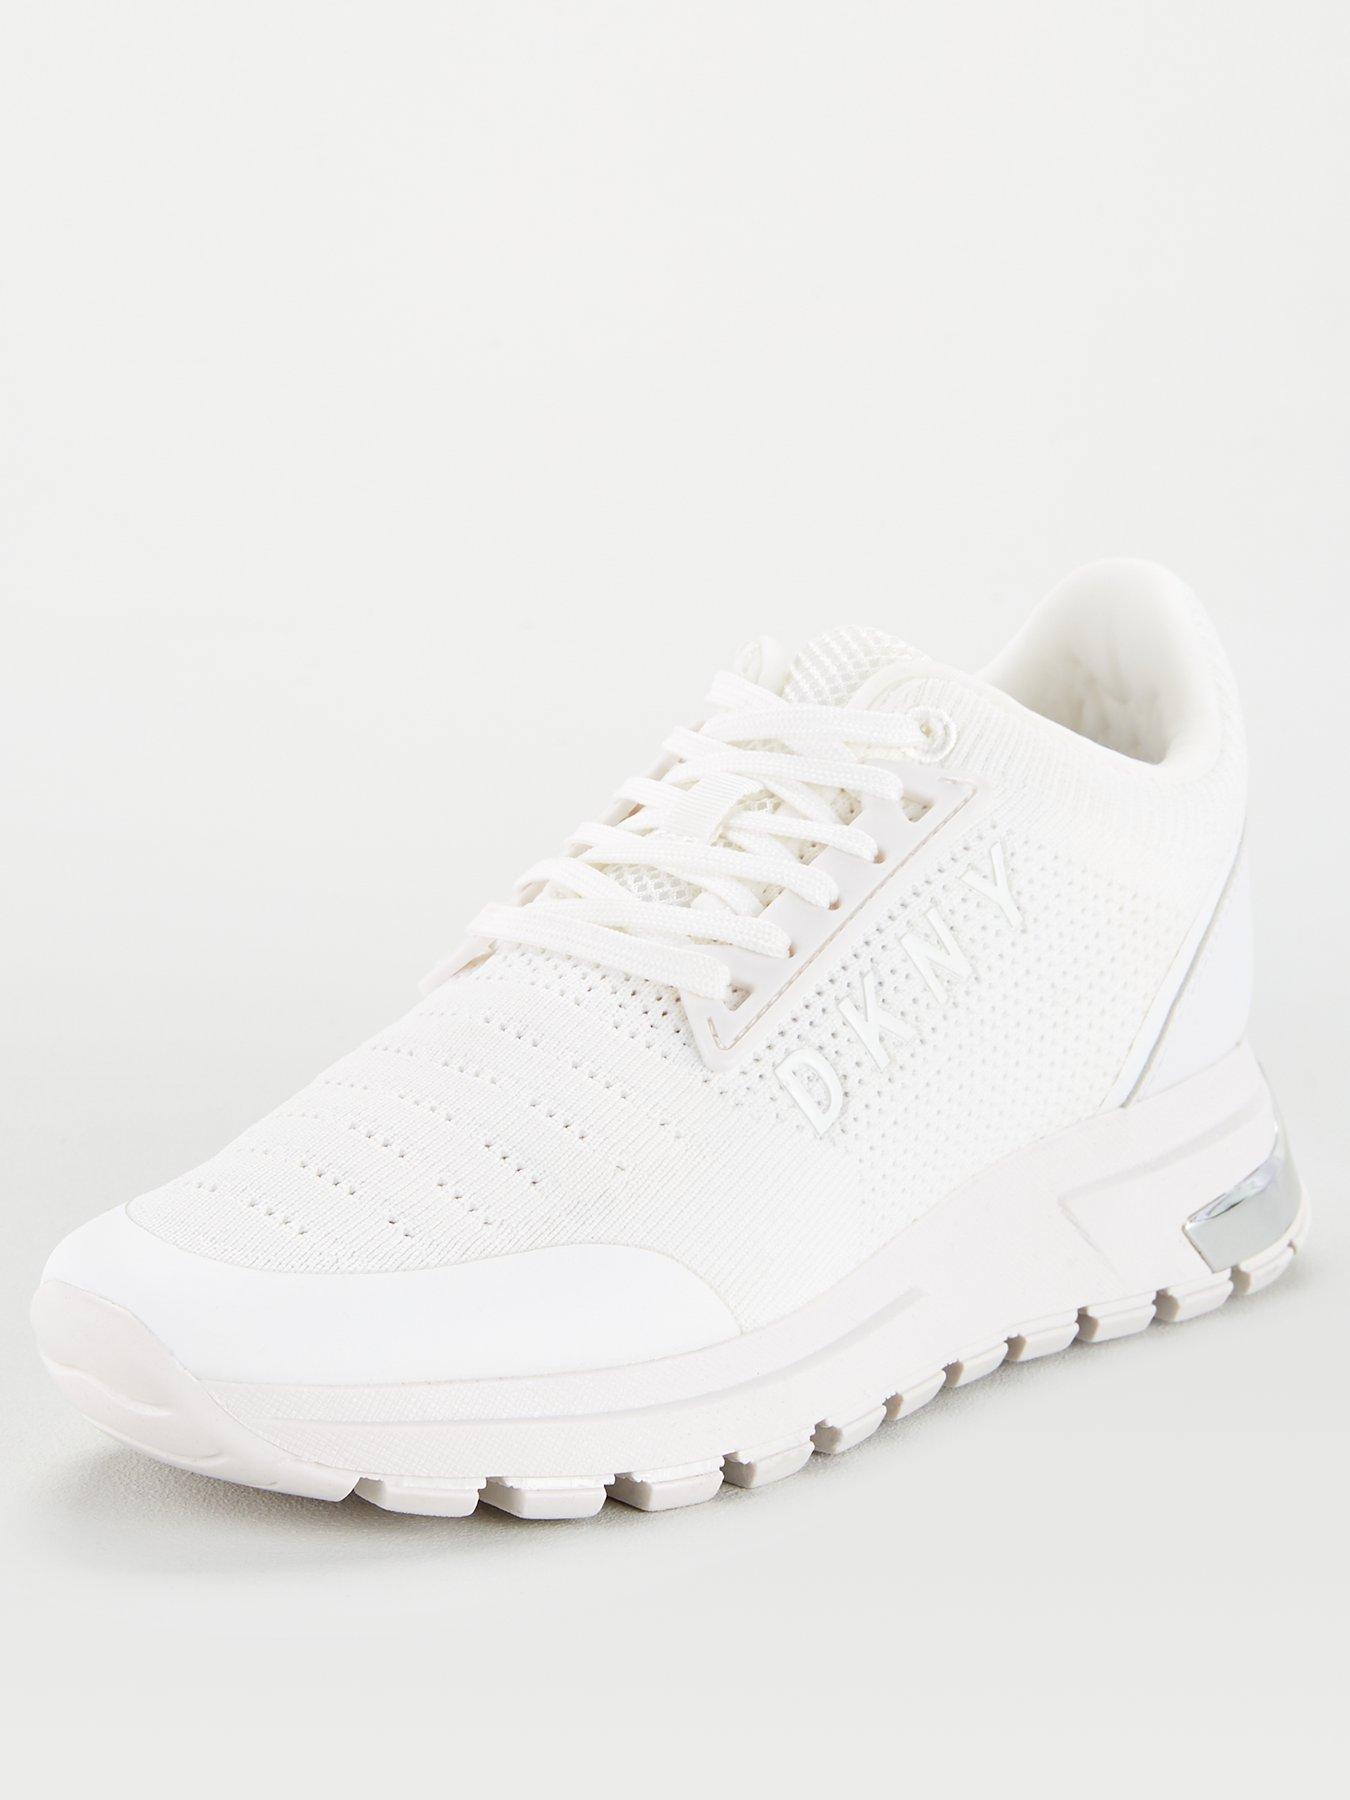 DKNY Melz Knit Logo Trainers - White